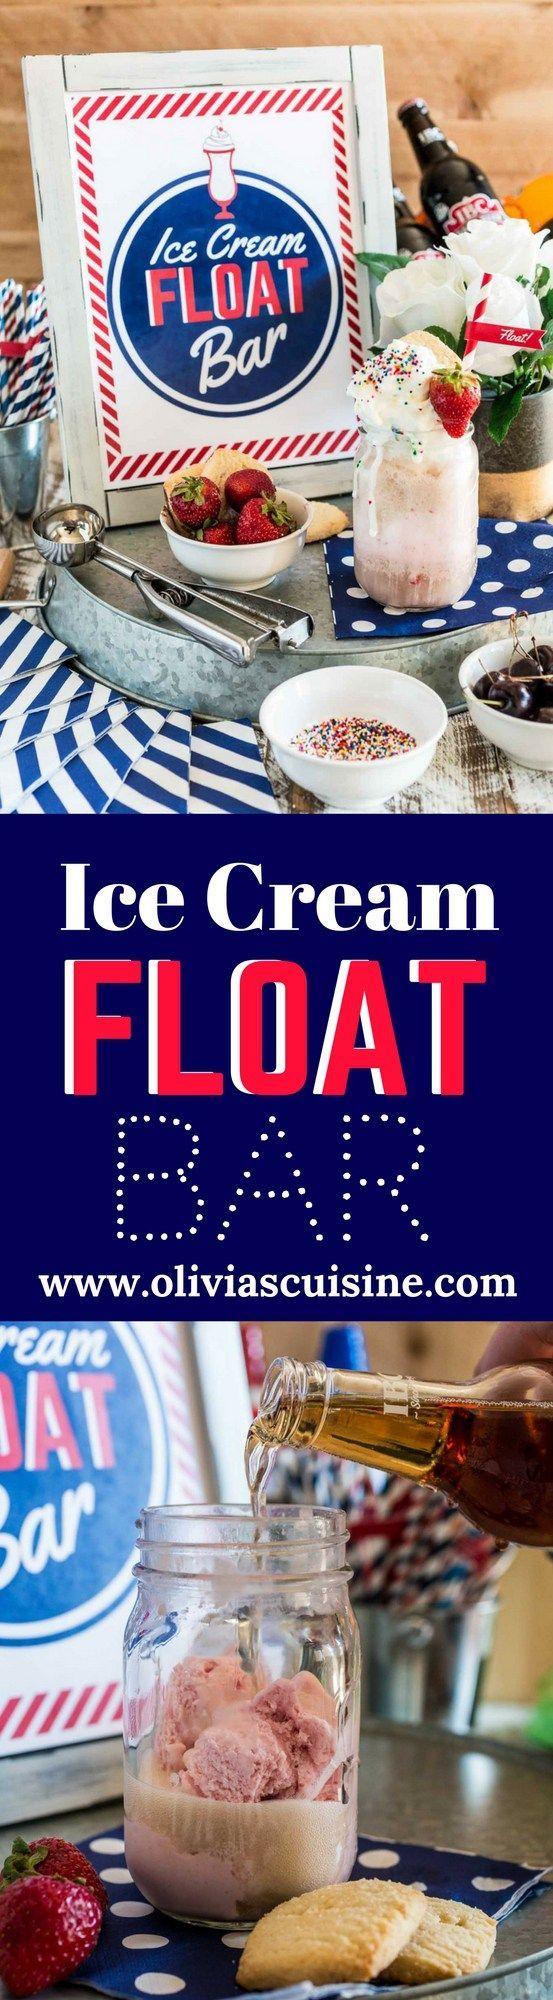 Ice Cream Float Bar